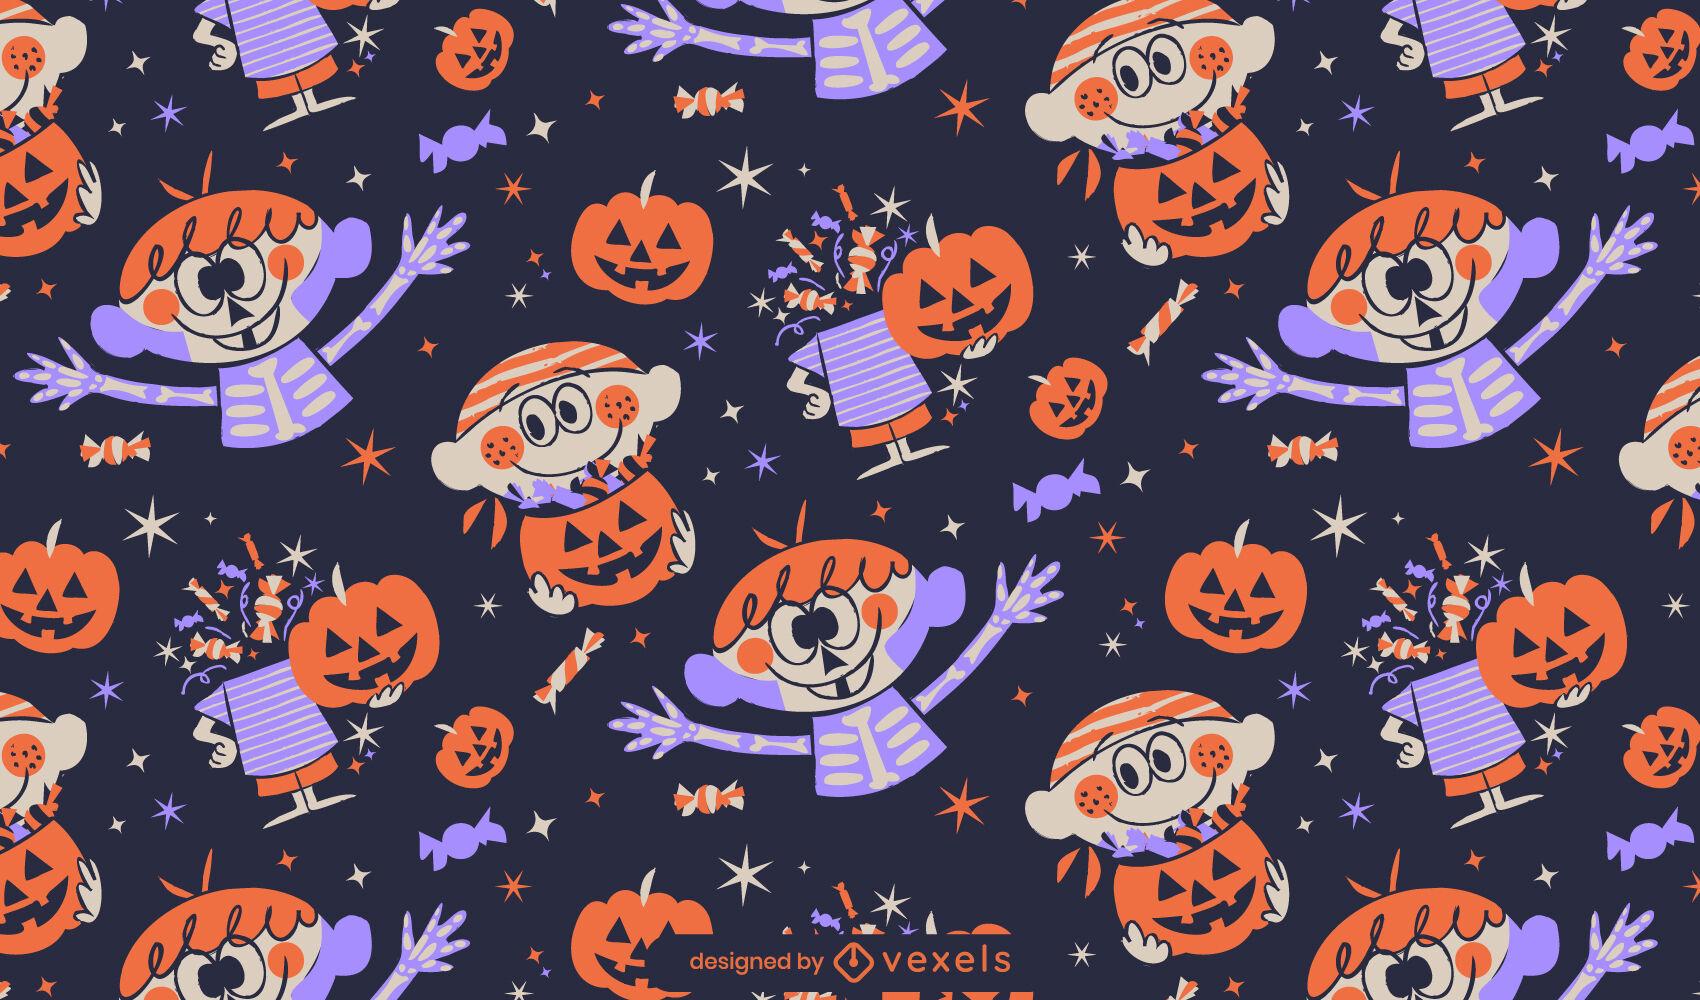 Retro-Cartoon-Halloween-Muster